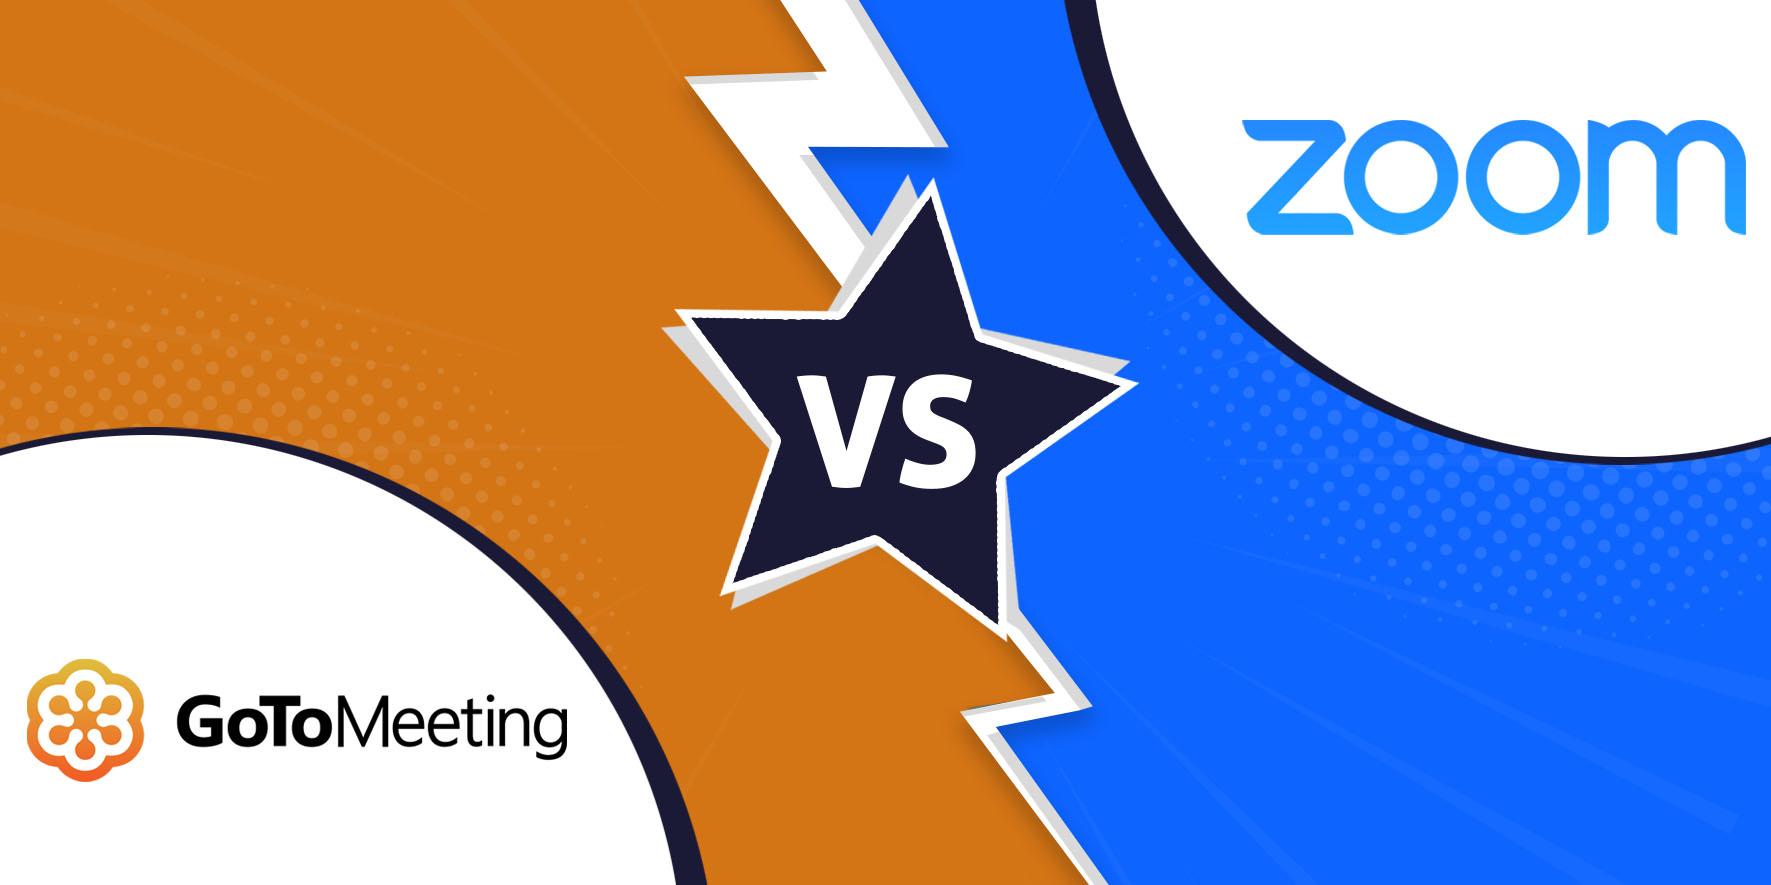 Zoom و GoToMeeting